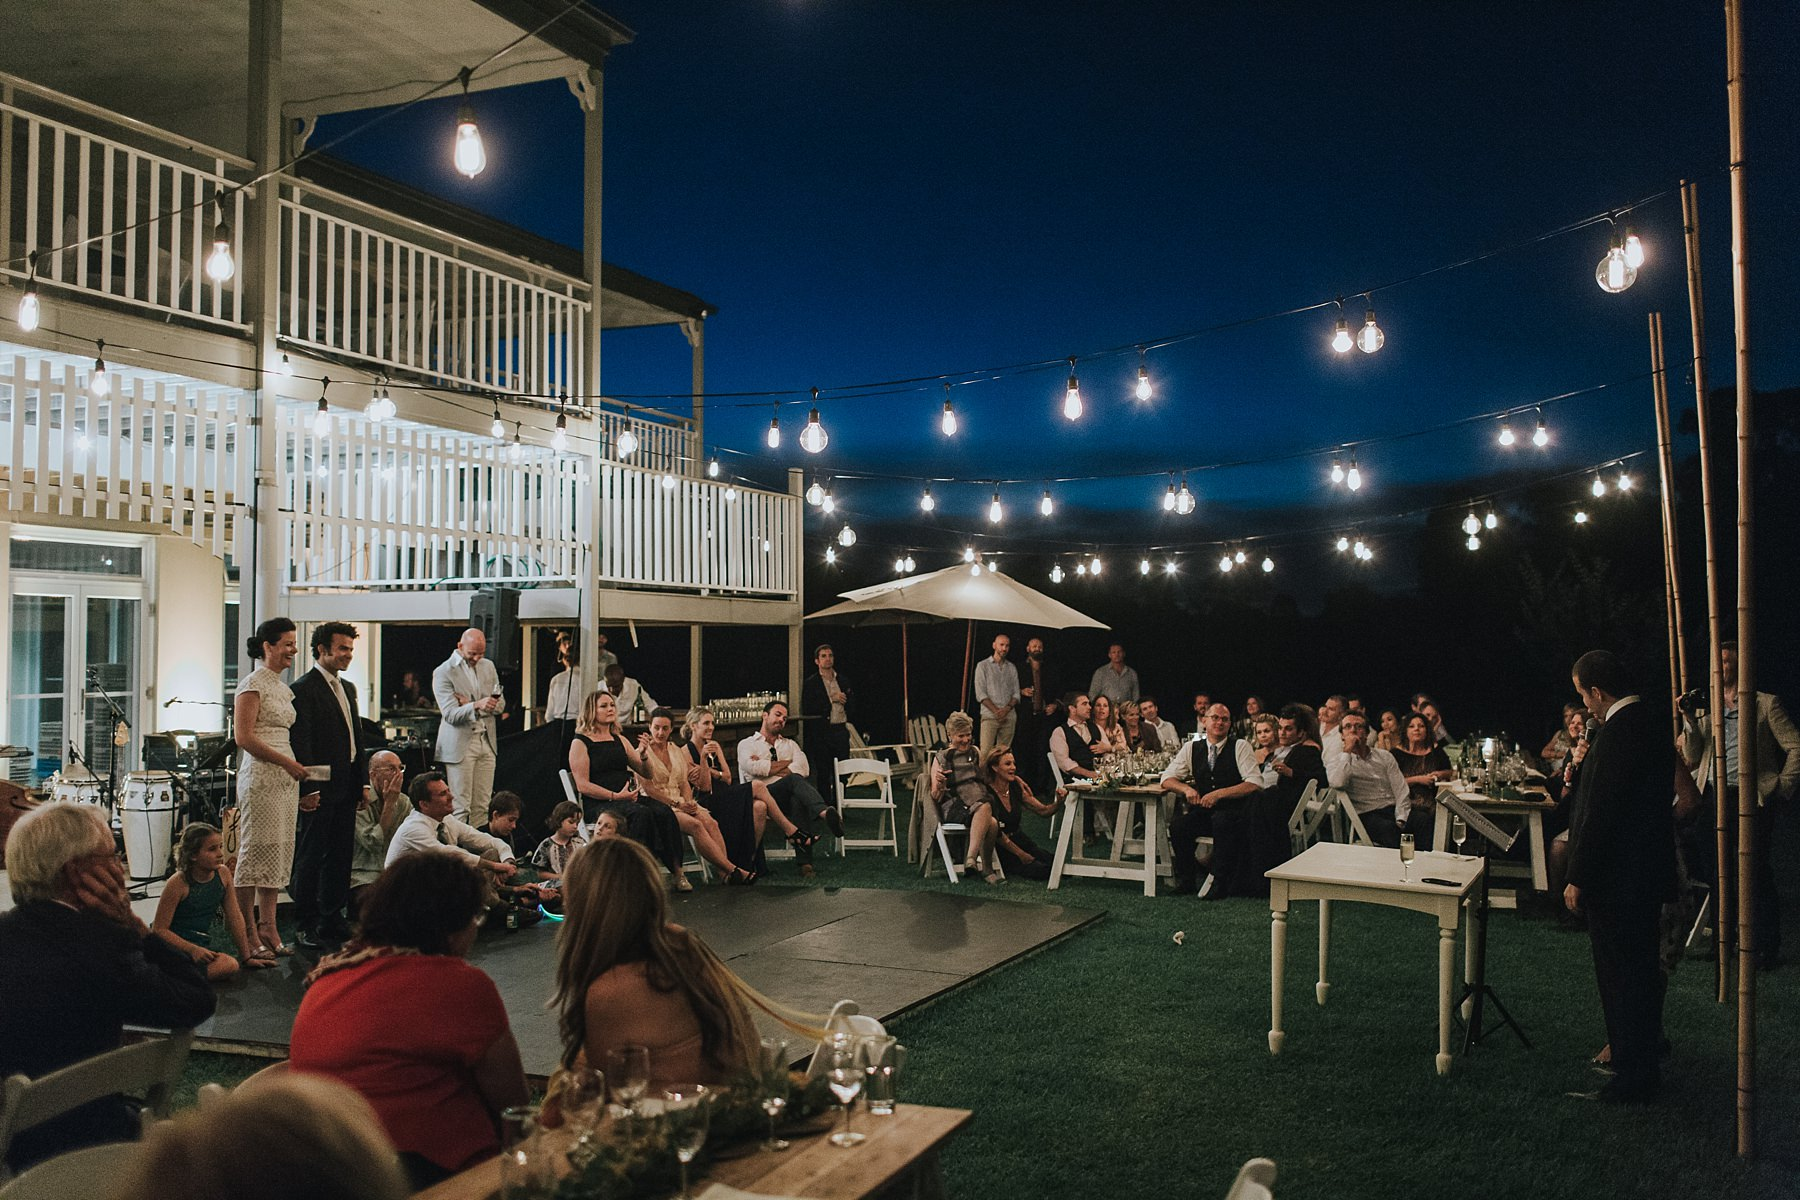 speeches at cornwallis house under the night sky